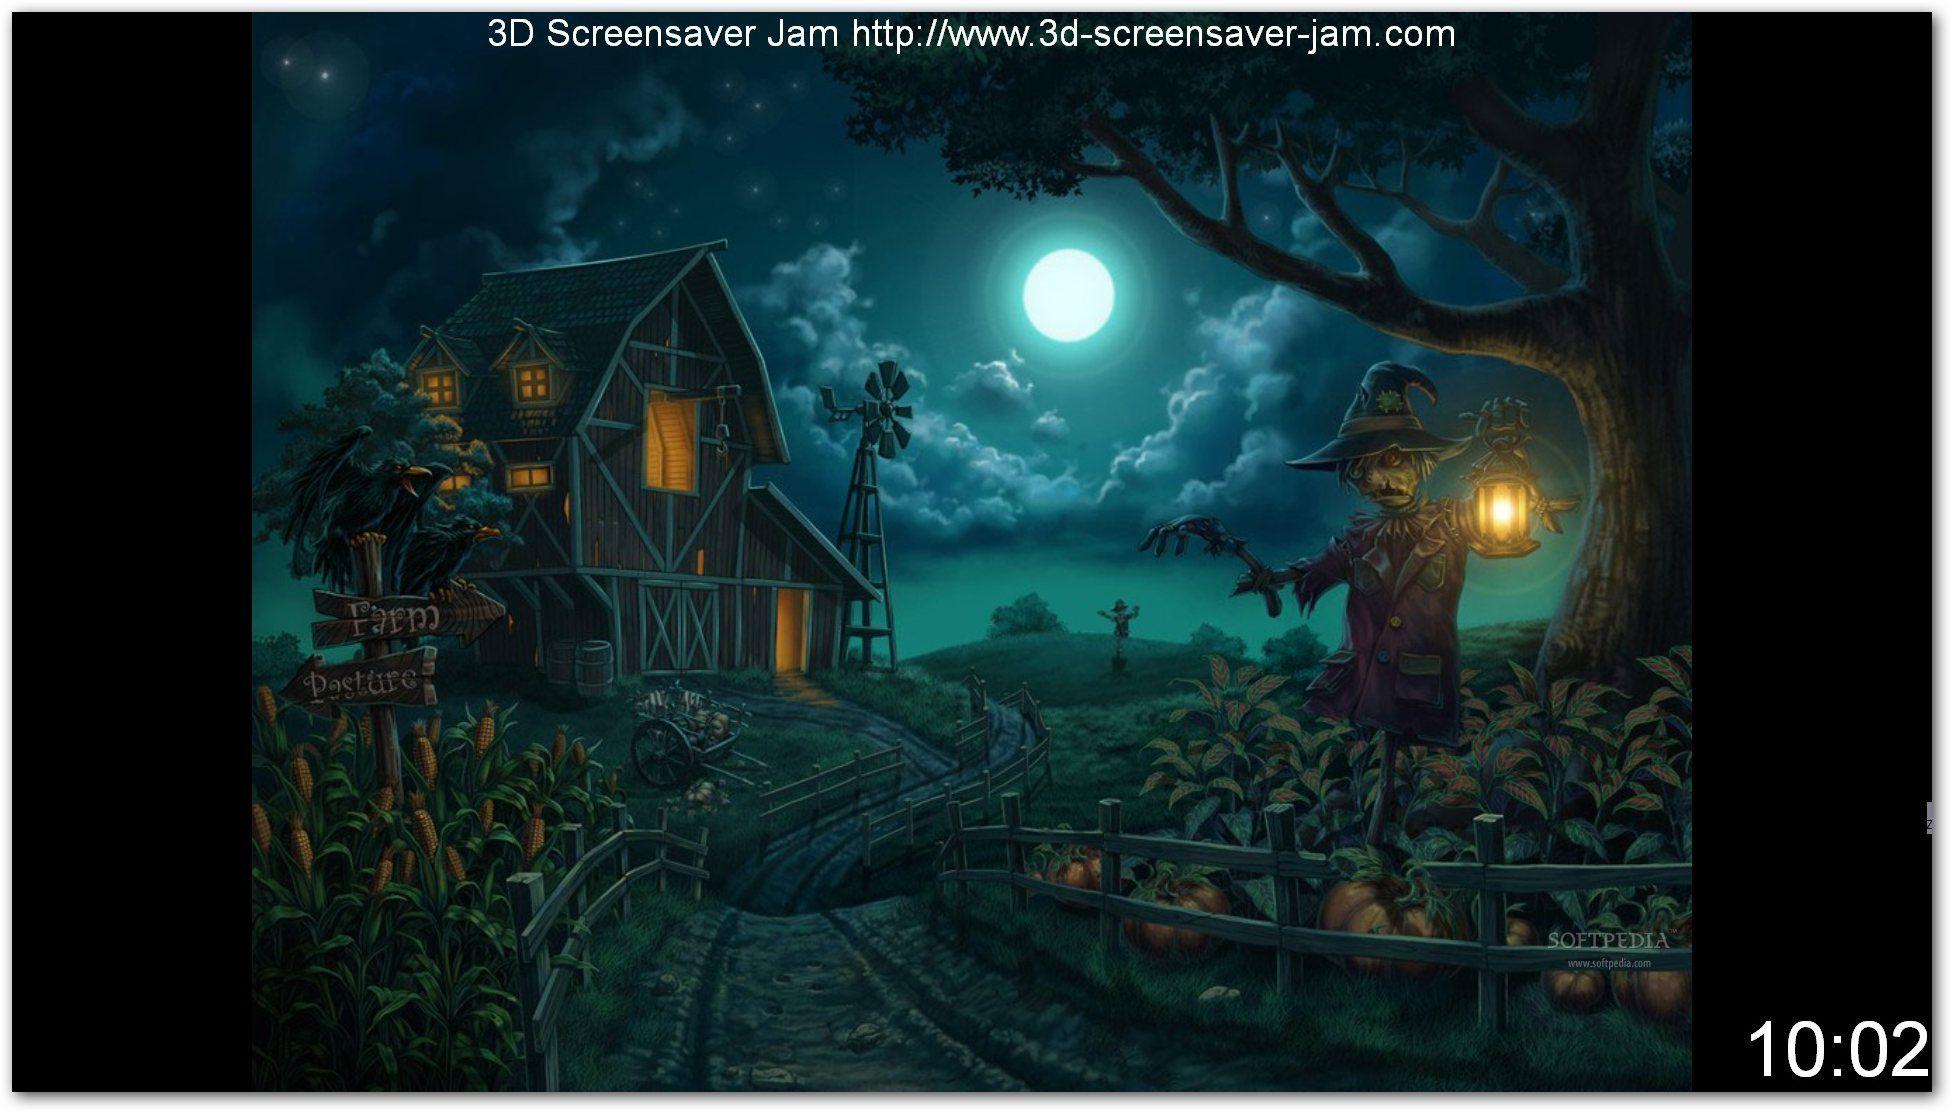 Halloween Screensavers   Halloween Screensaver screenshot 1 - Free Autumn Halloween Screensaver ...